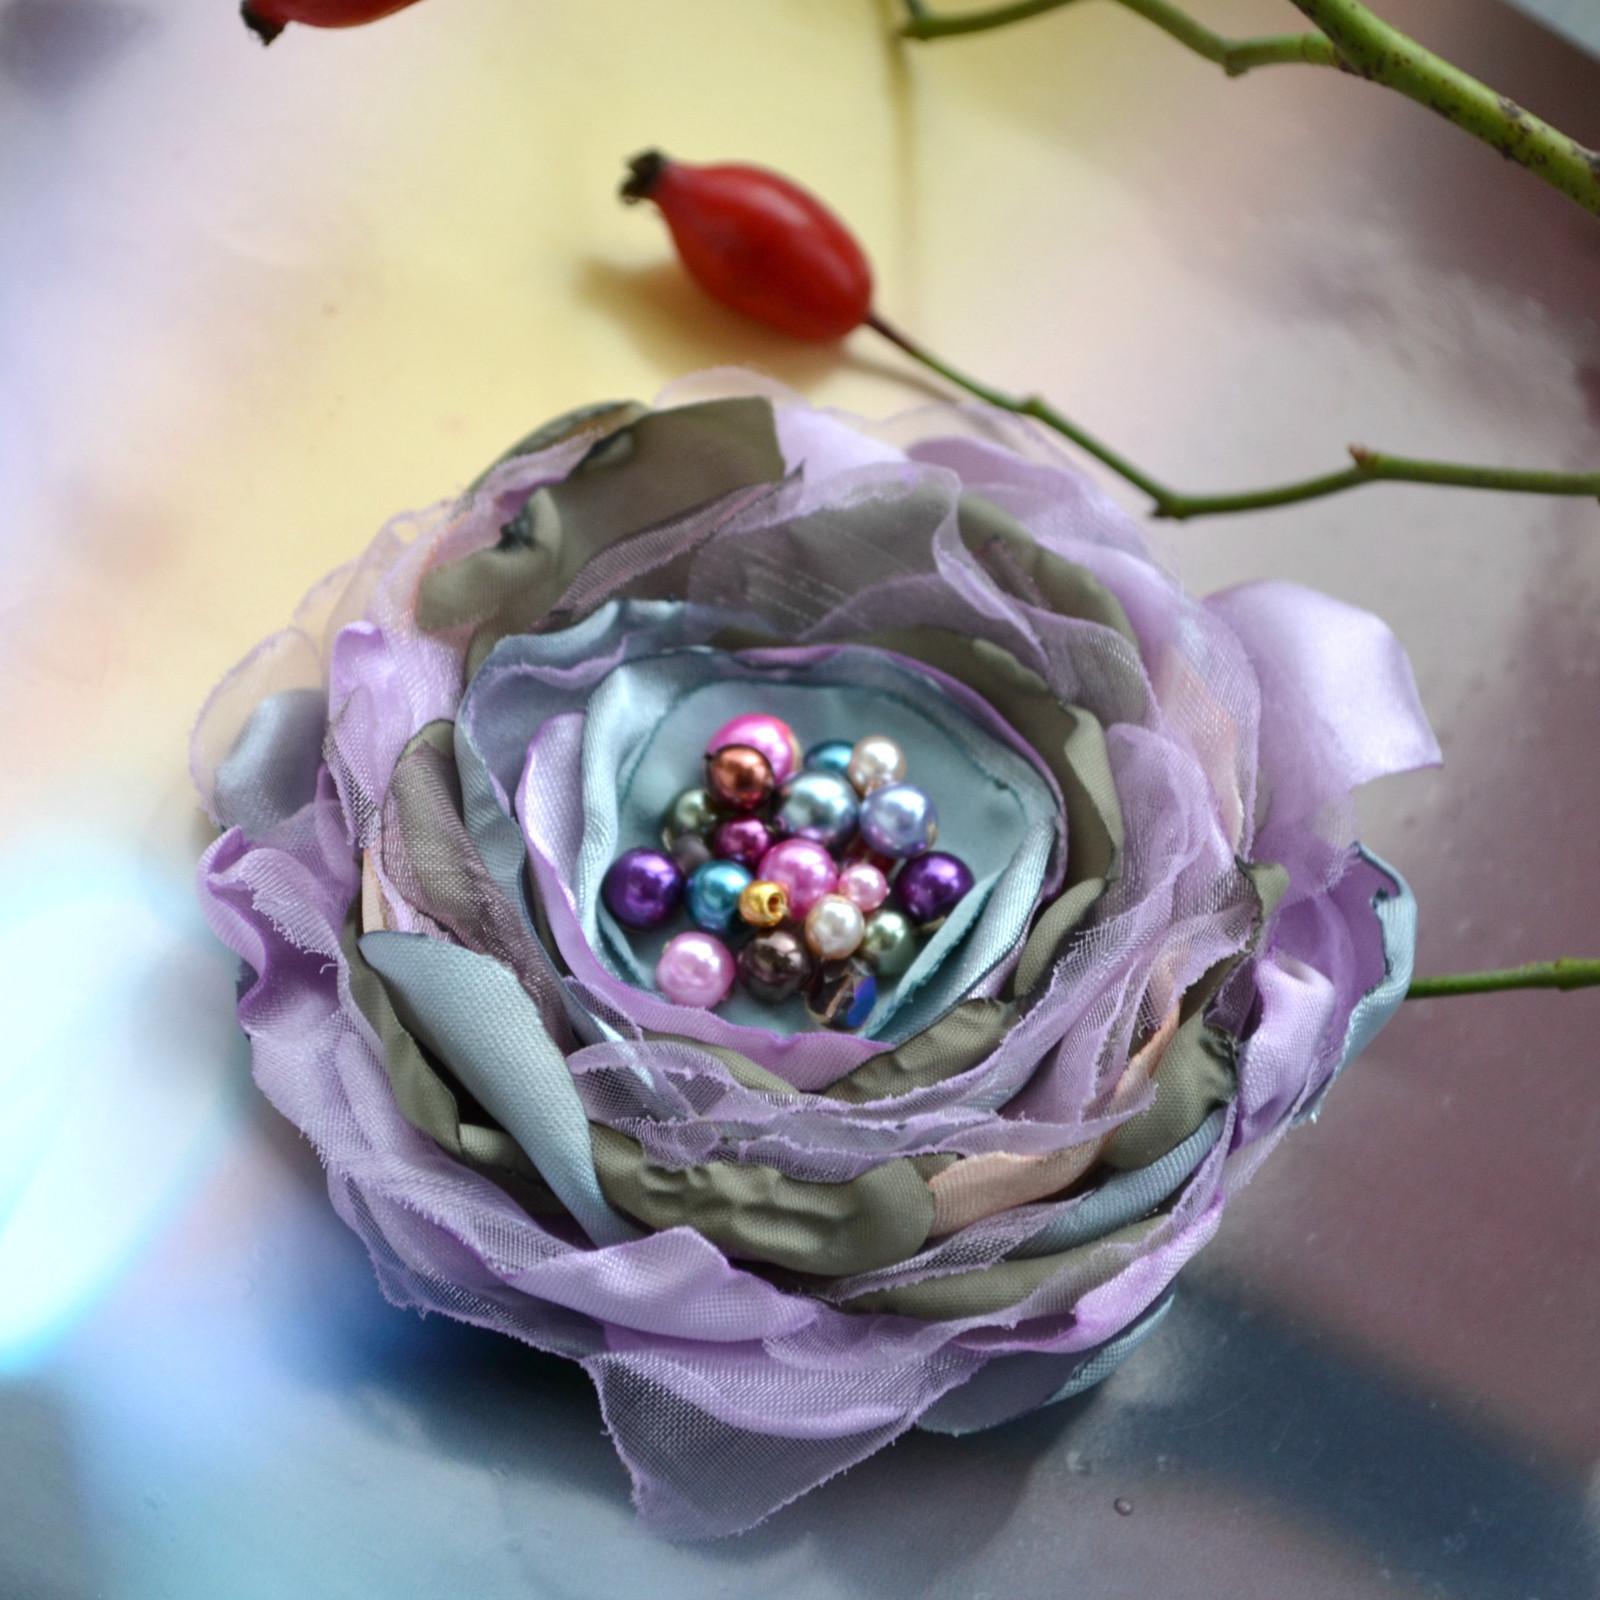 Brož i květ do vlasů Barborka   Zboží prodejce Kruchy  e7da8cae12